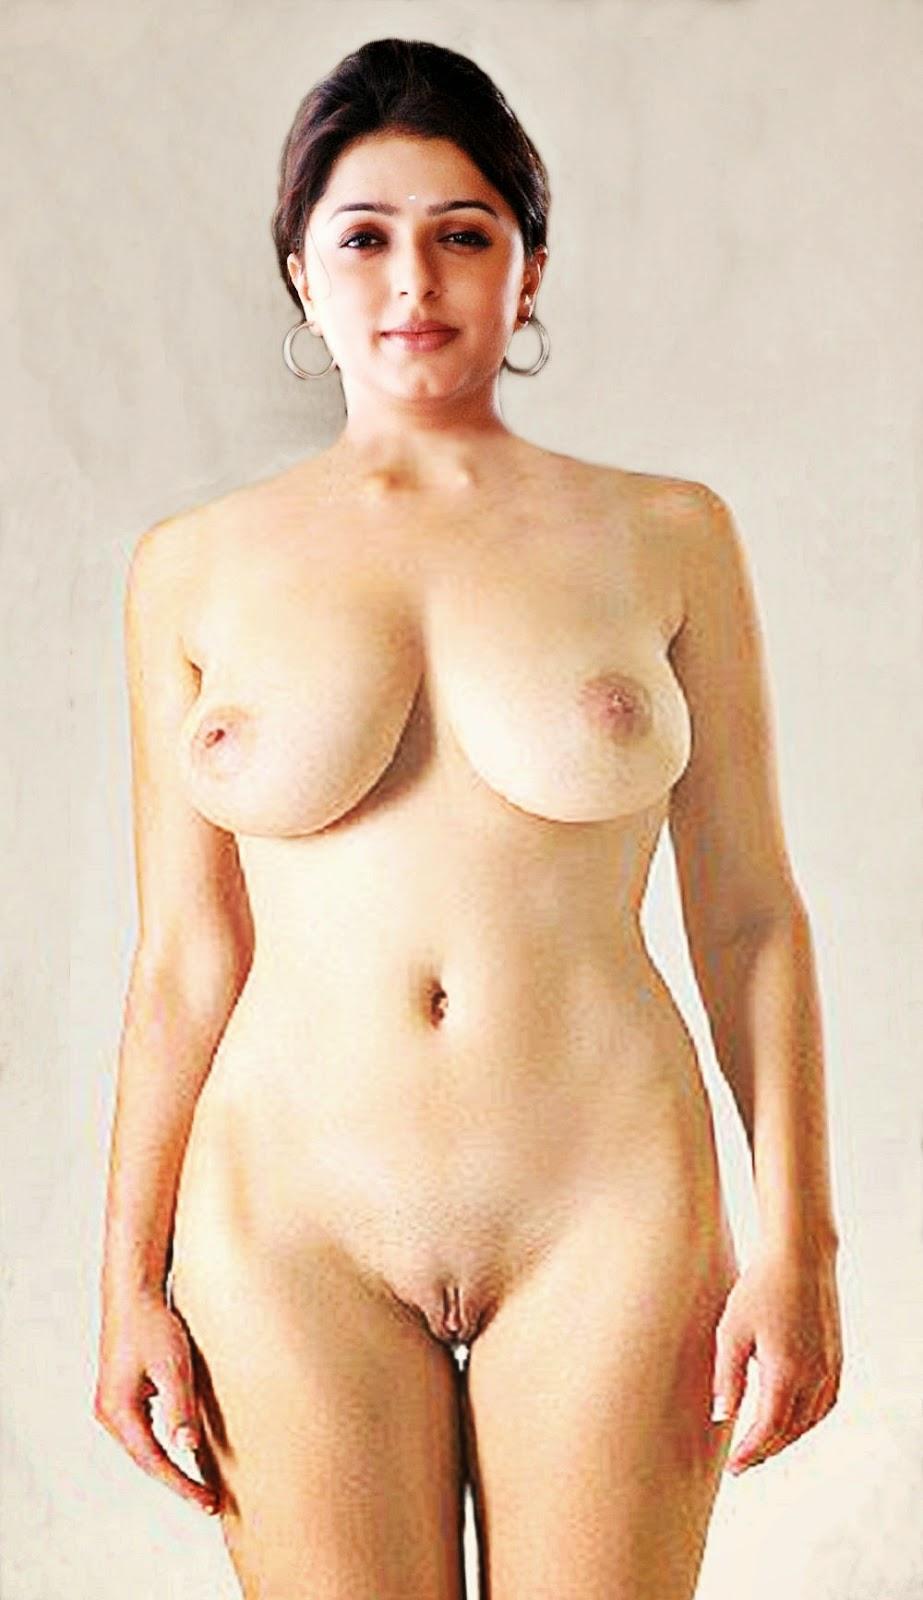 Bhumika chawla naked pic